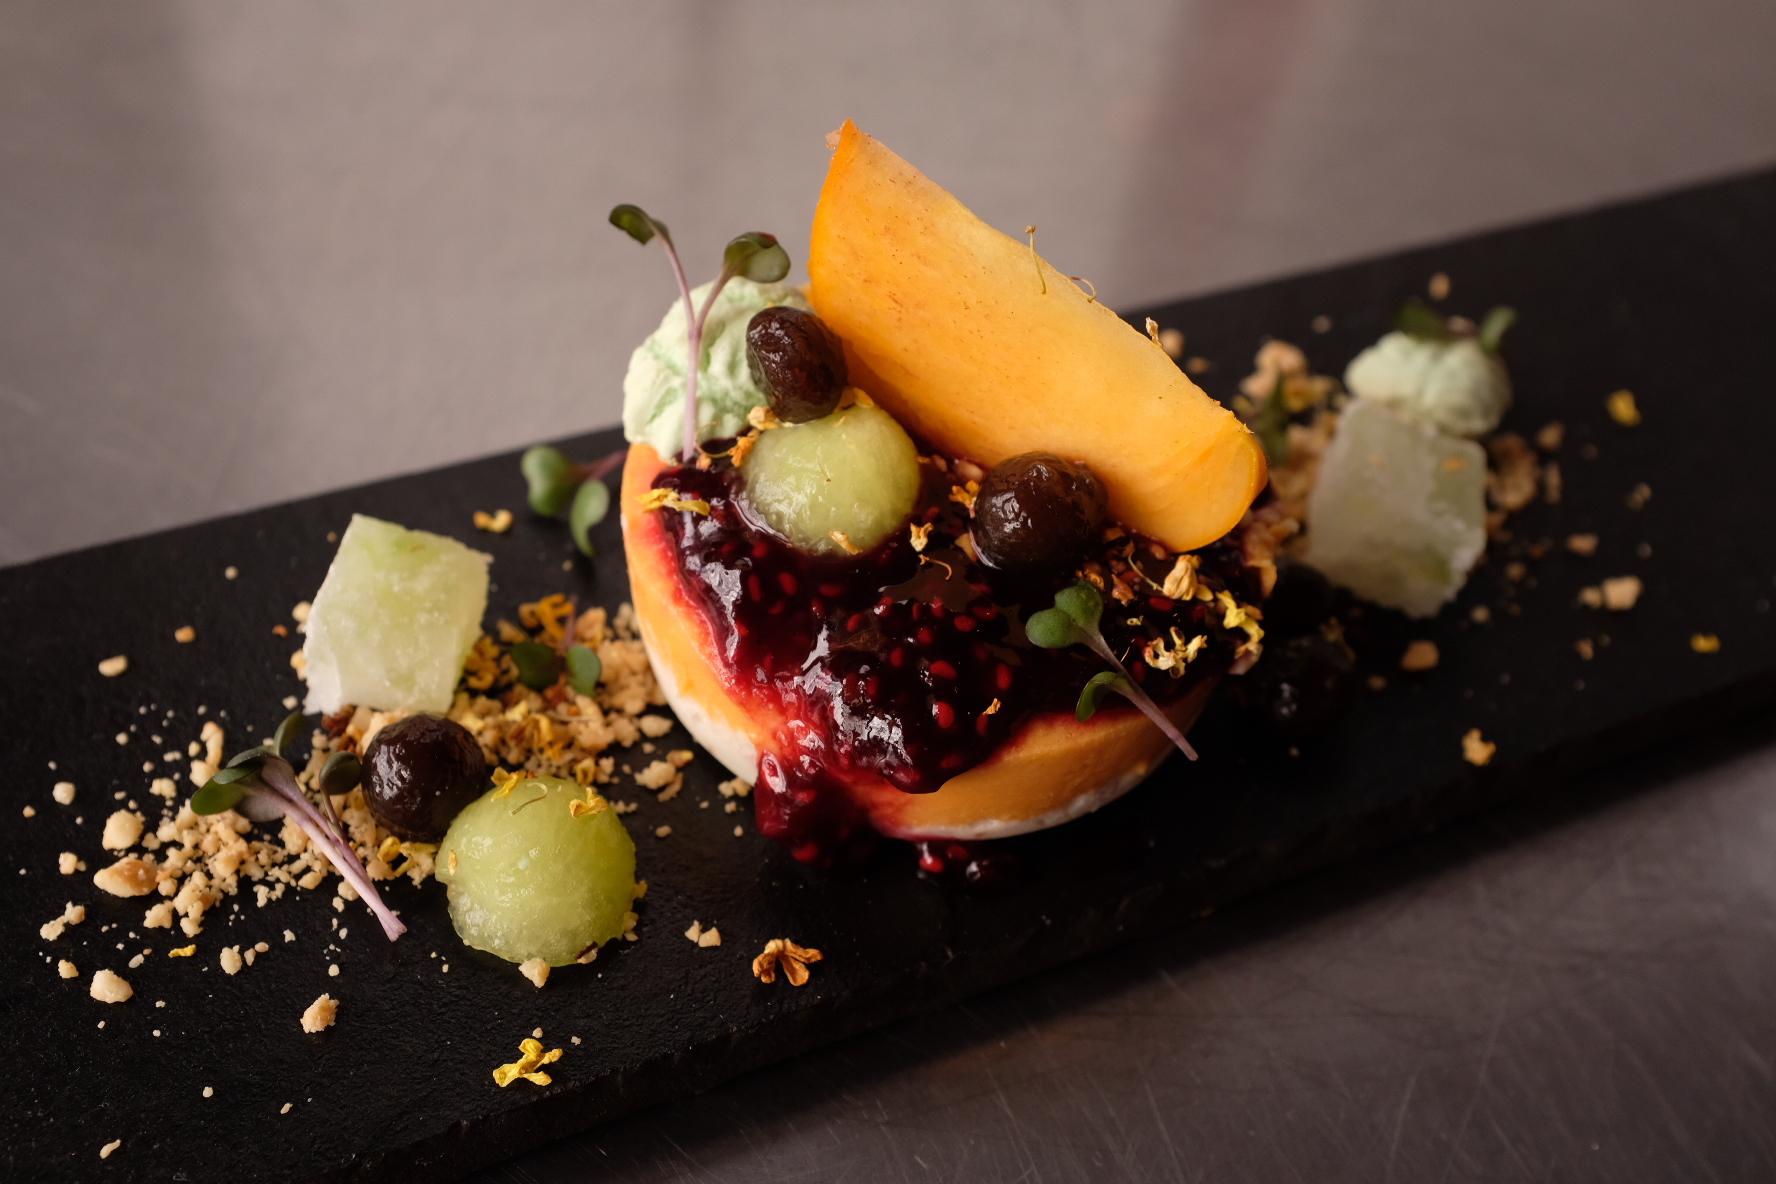 Papaya cheesecake, persimmon, winter melon sugar and raspberry jam